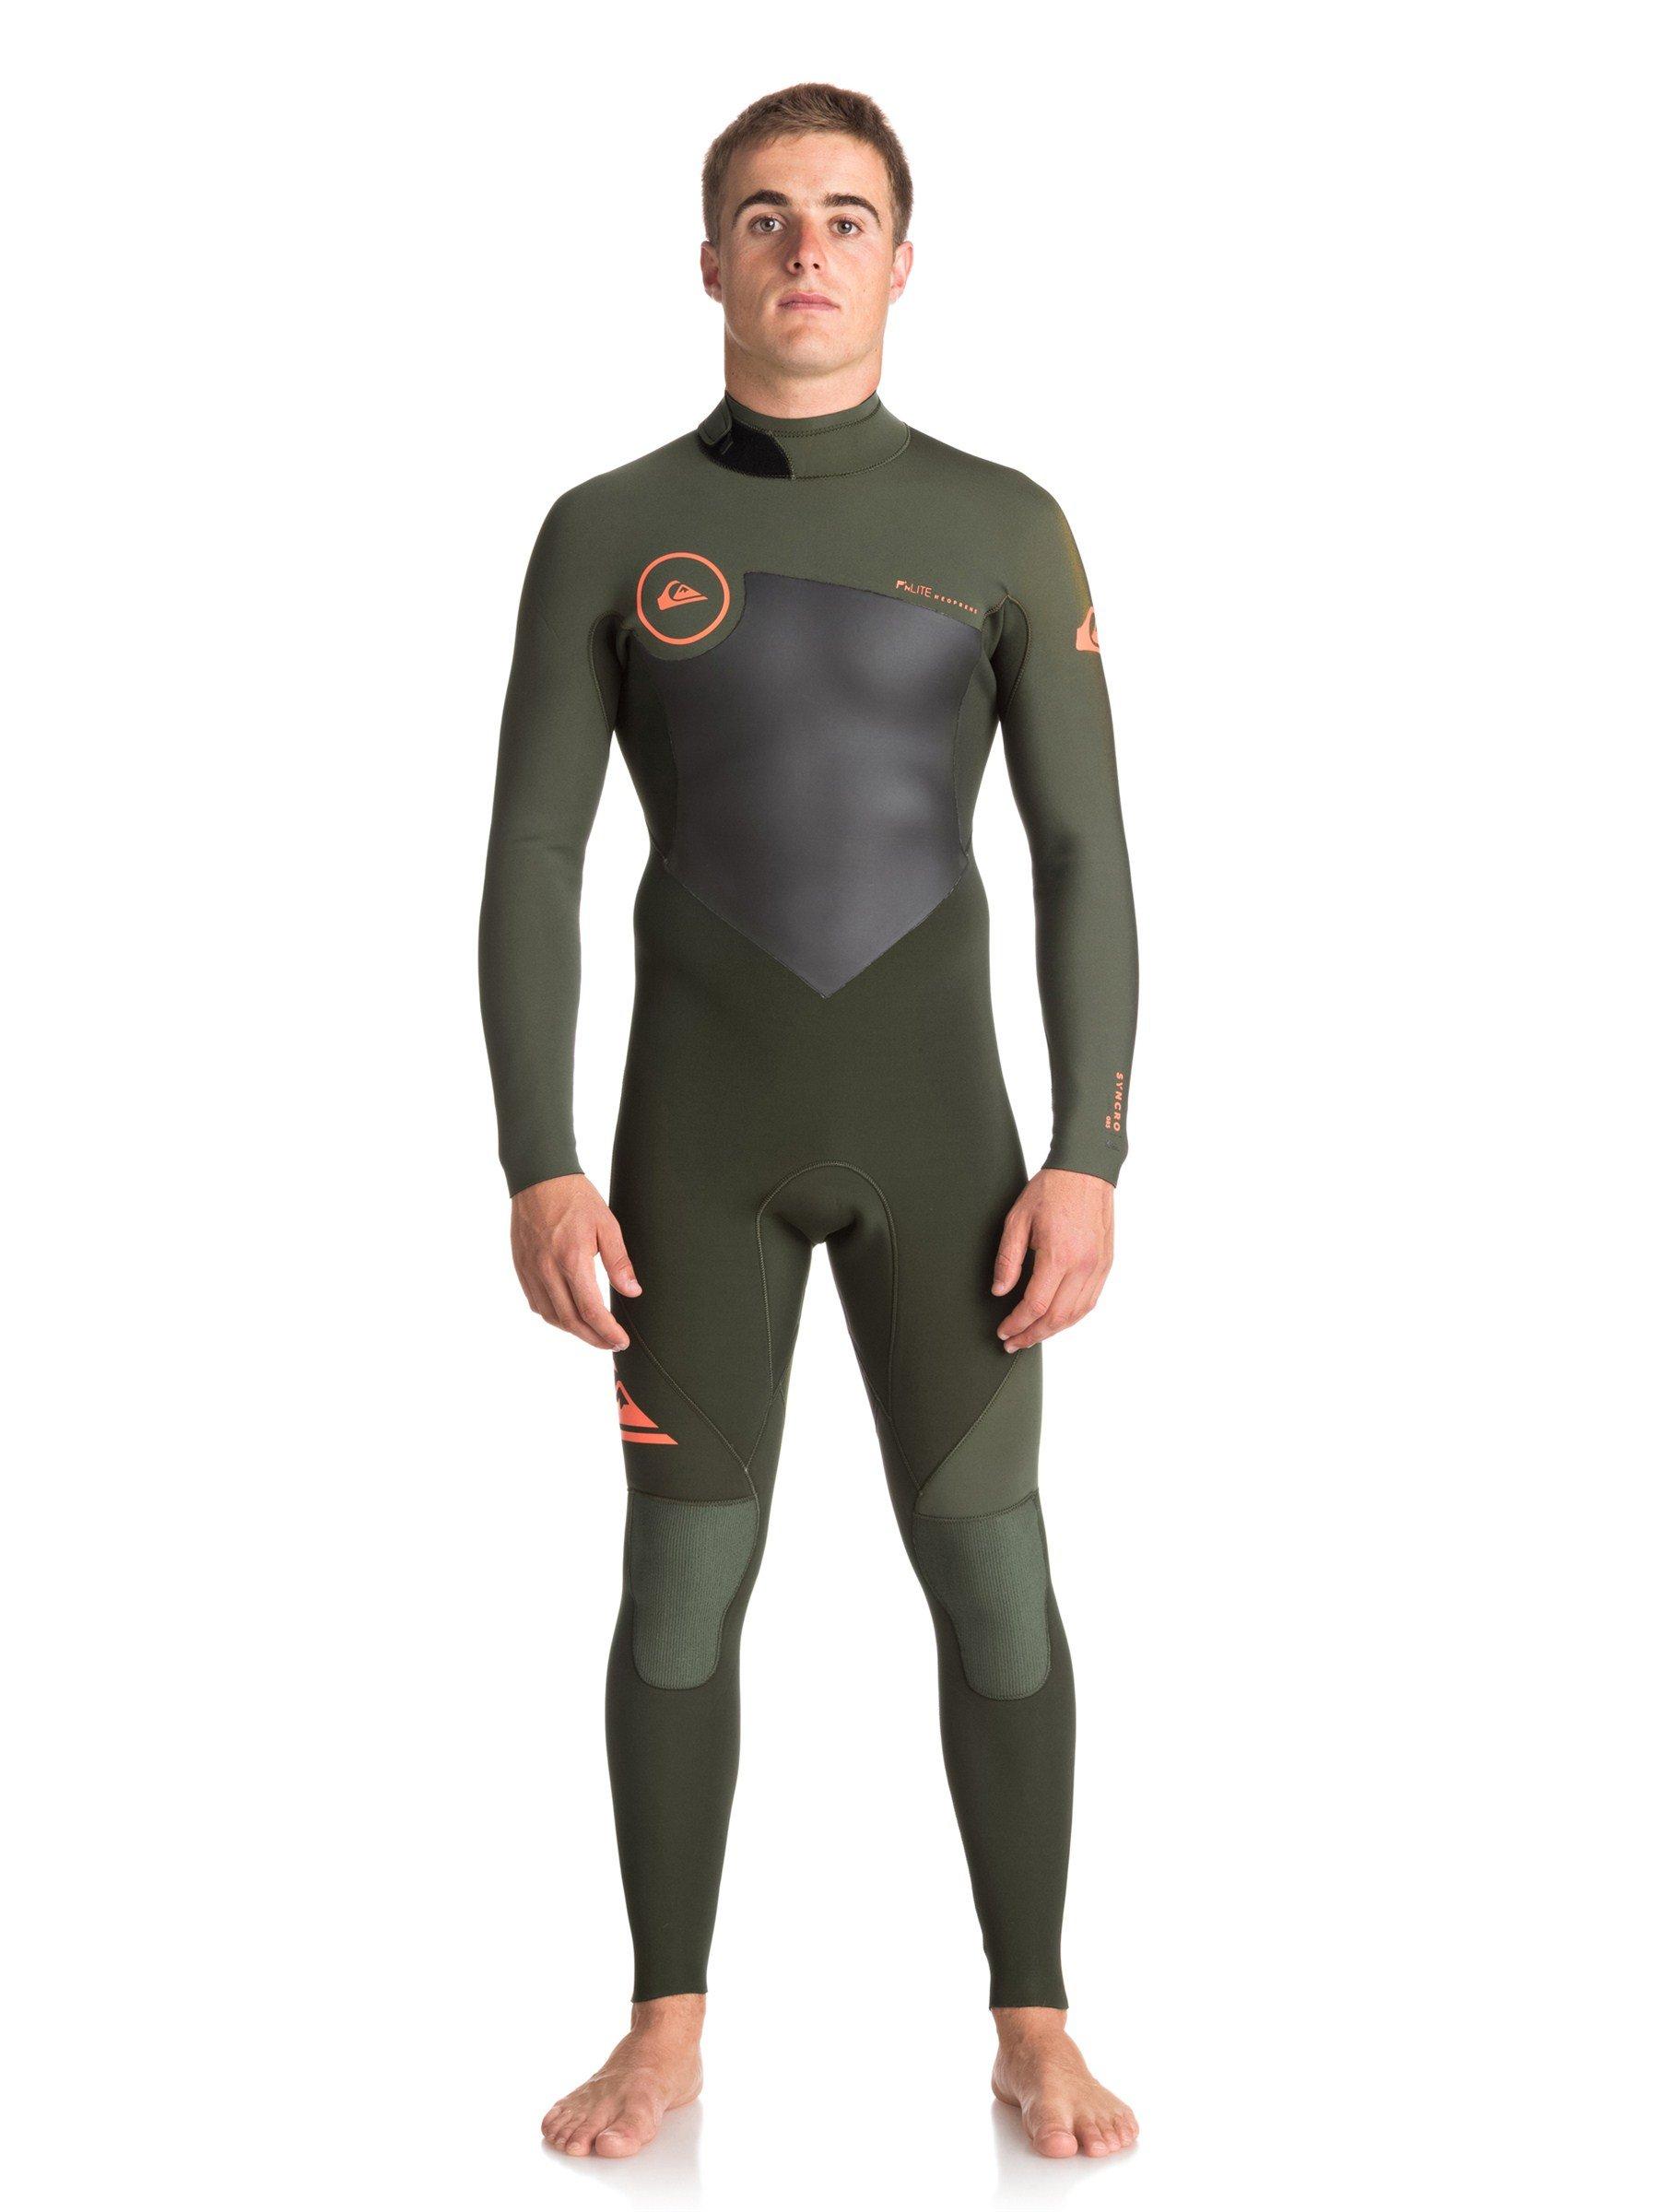 Quiksilver Mens 4/3Mm Syncro Series Back Zip Gbs - Full Wetsuit Full Wetsuit Dark Ivy/ Ivy/ Shrimp Pink L